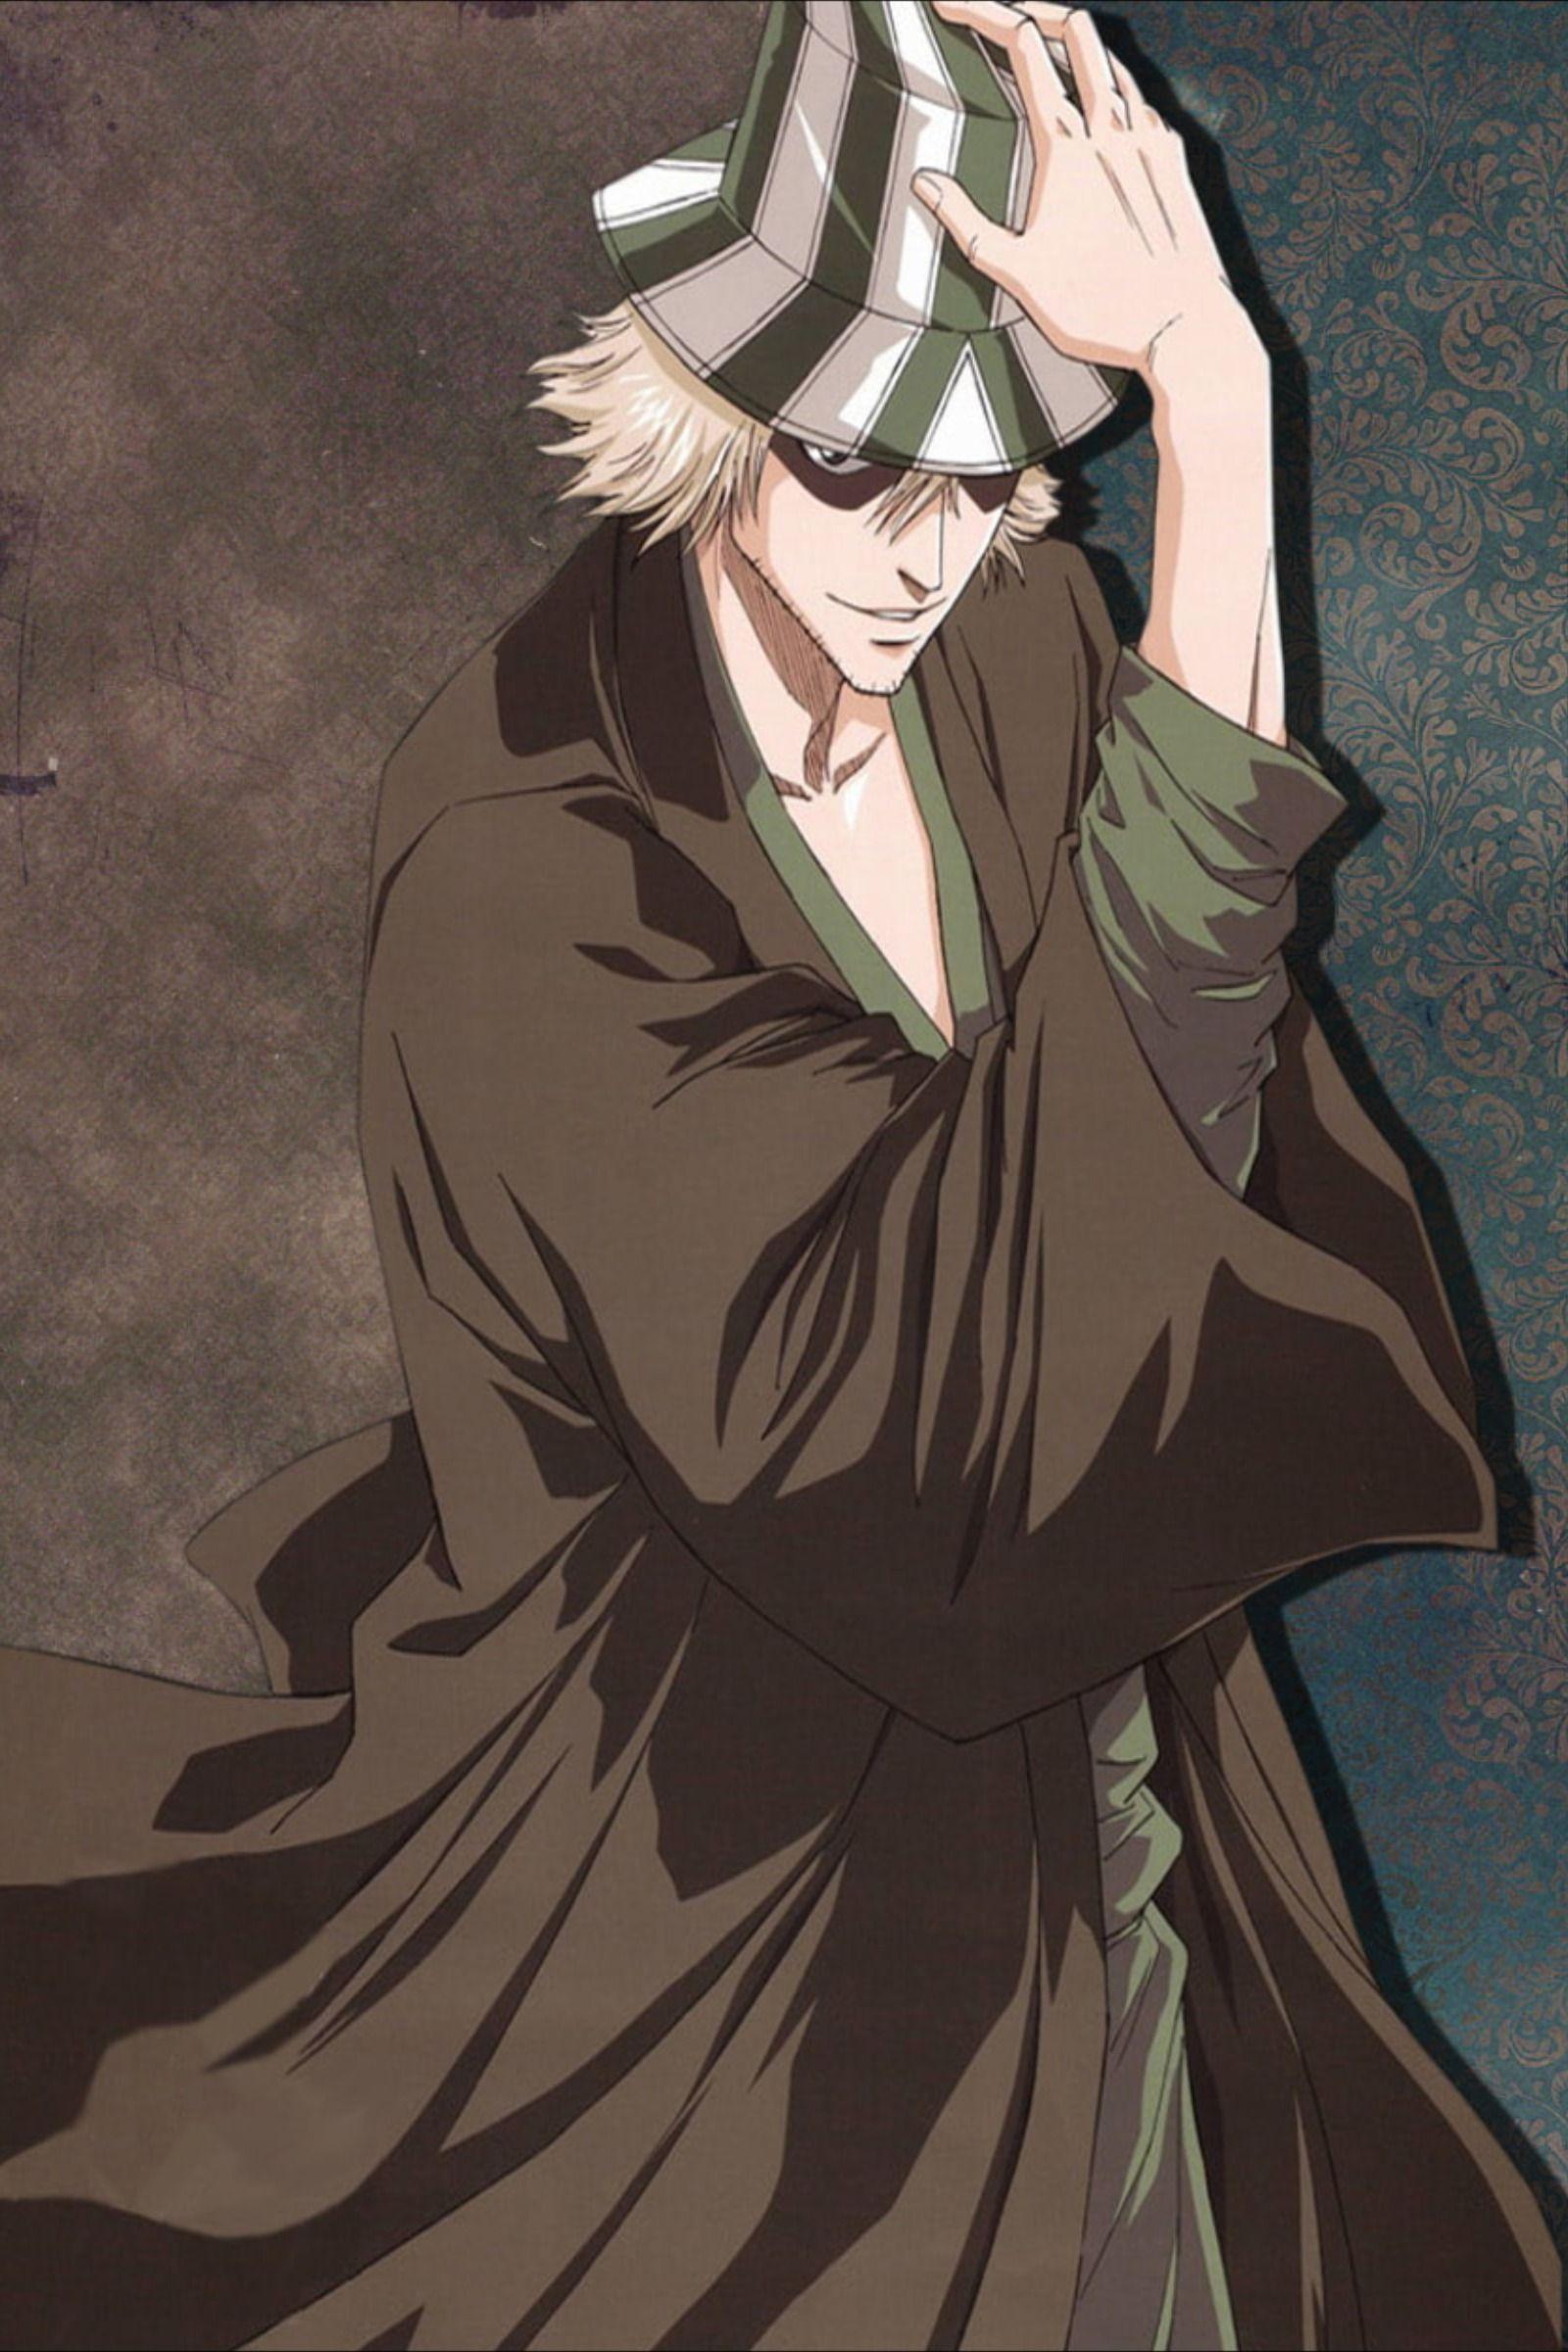 Kisuke Urahara Anime Bleach Birthday December 31